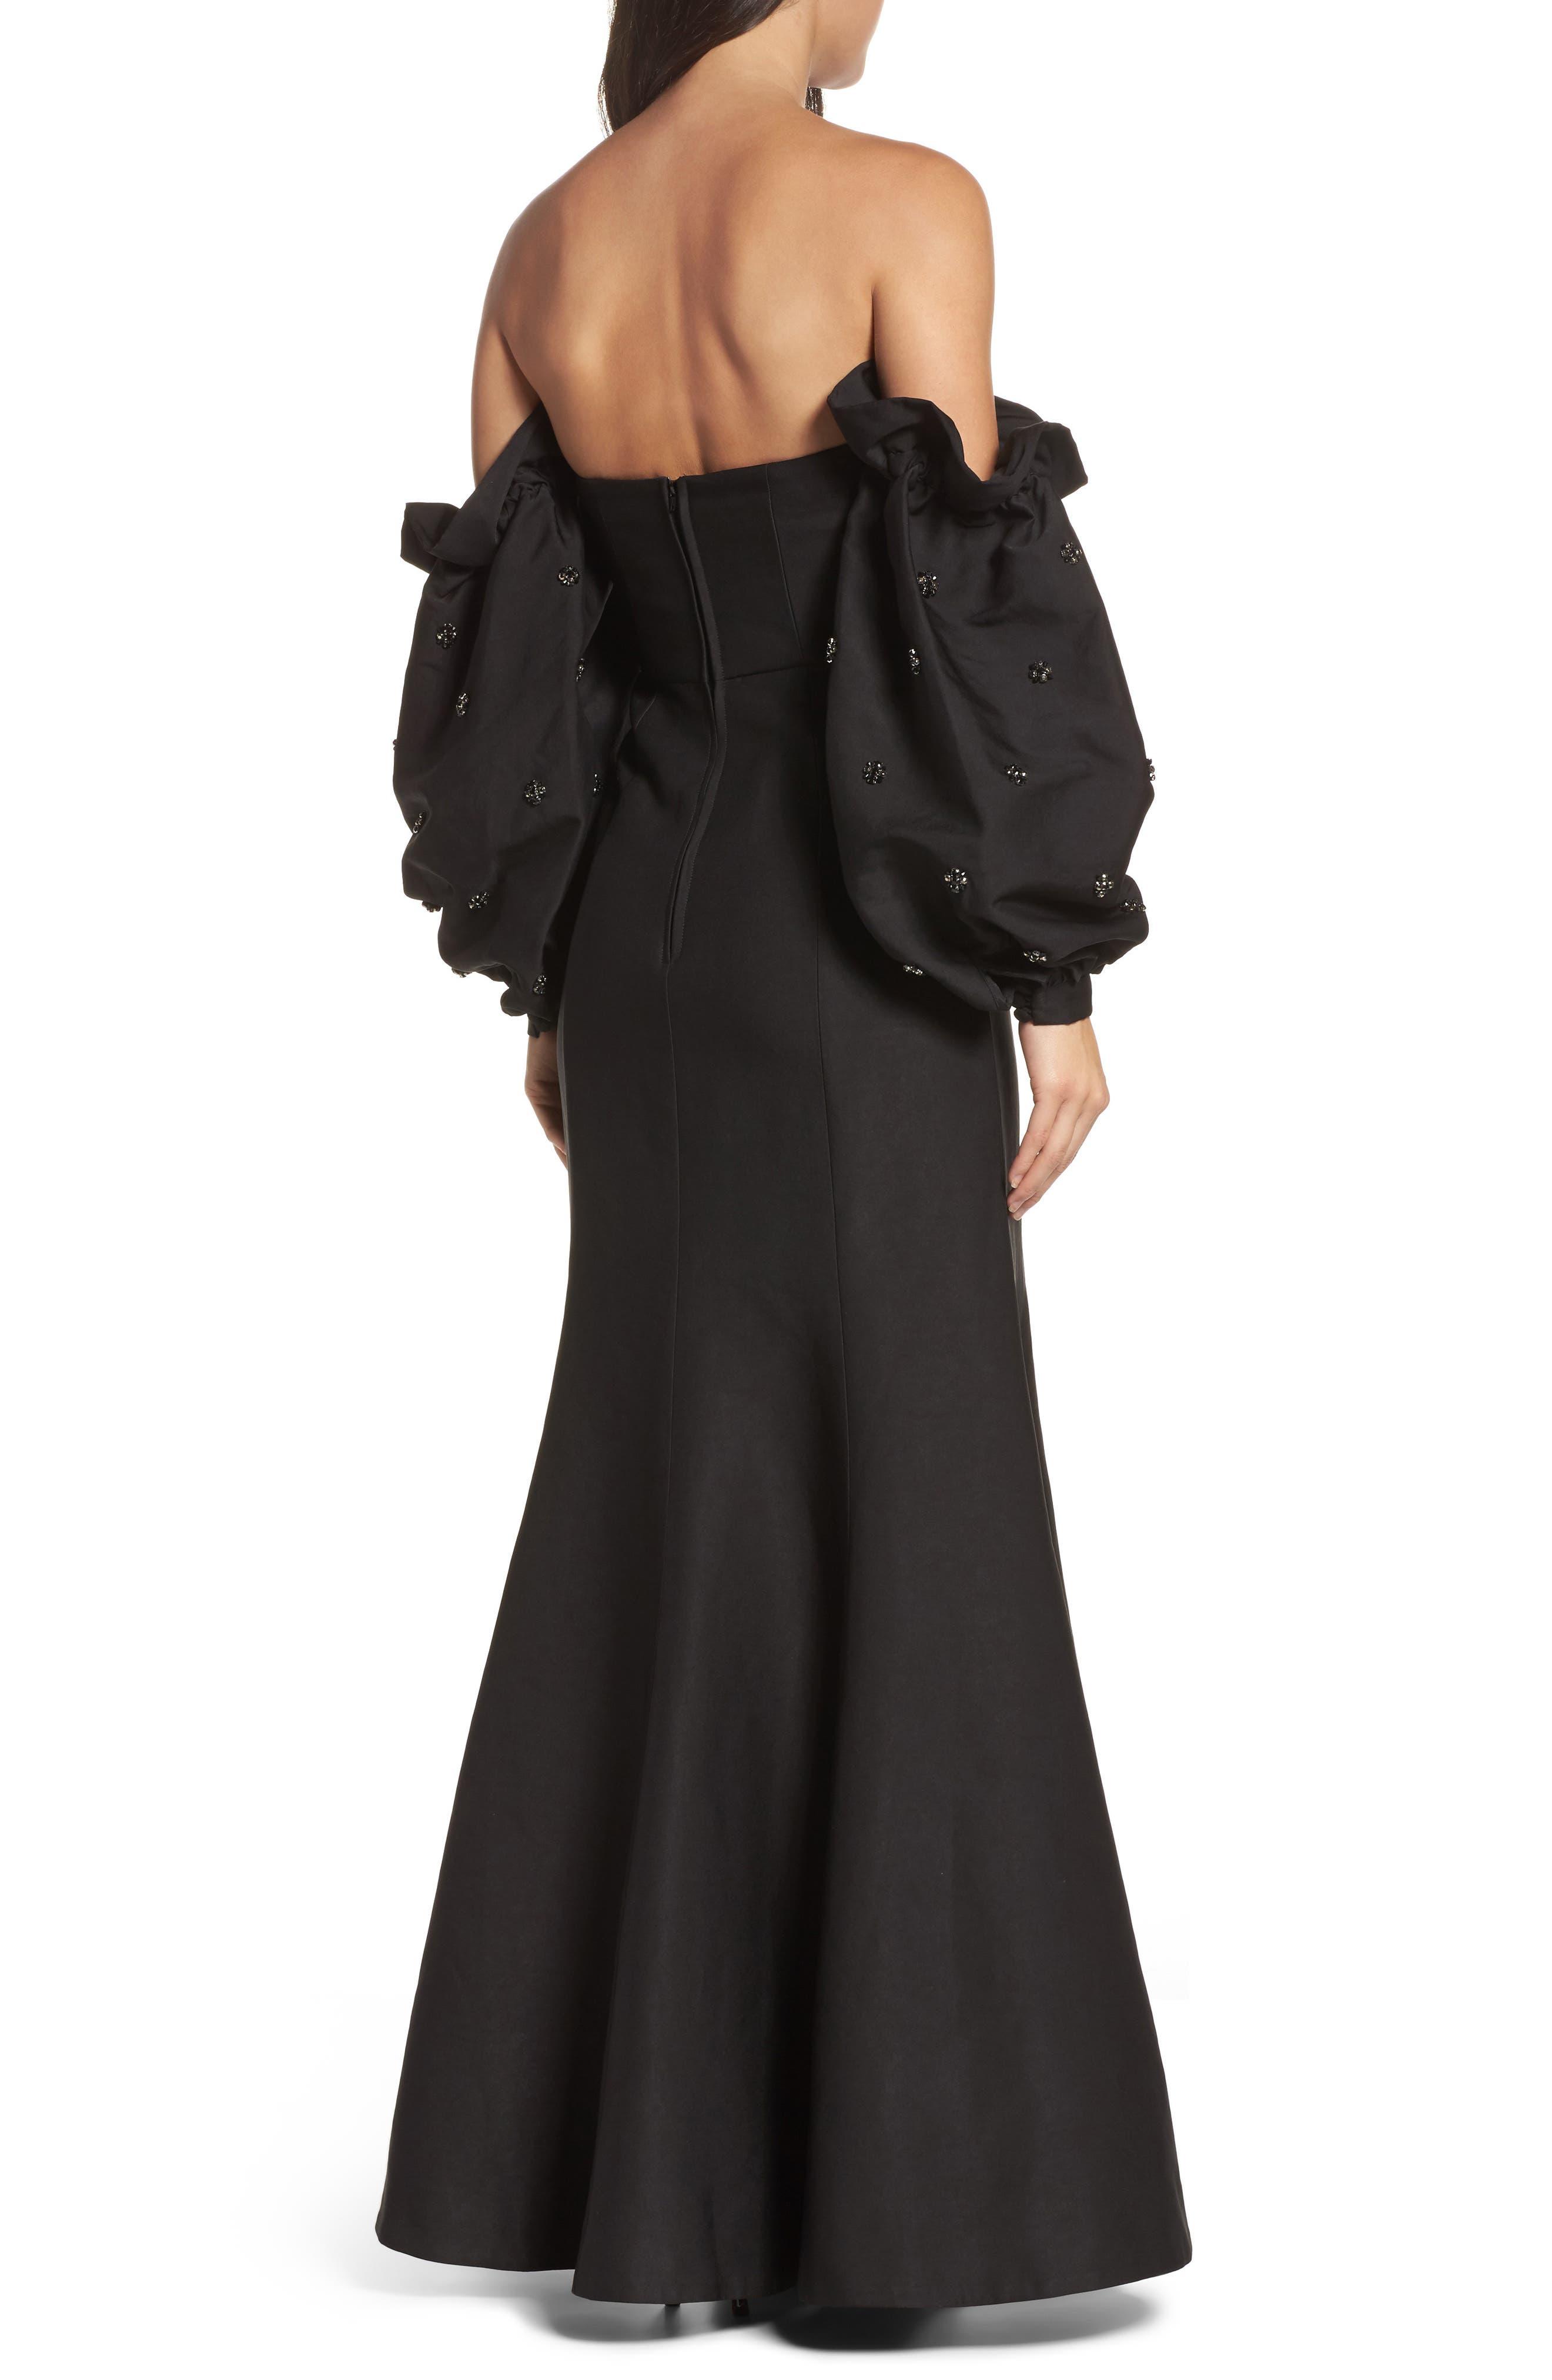 Assemble Embellished Off the Shoulder Gown,                             Alternate thumbnail 2, color,